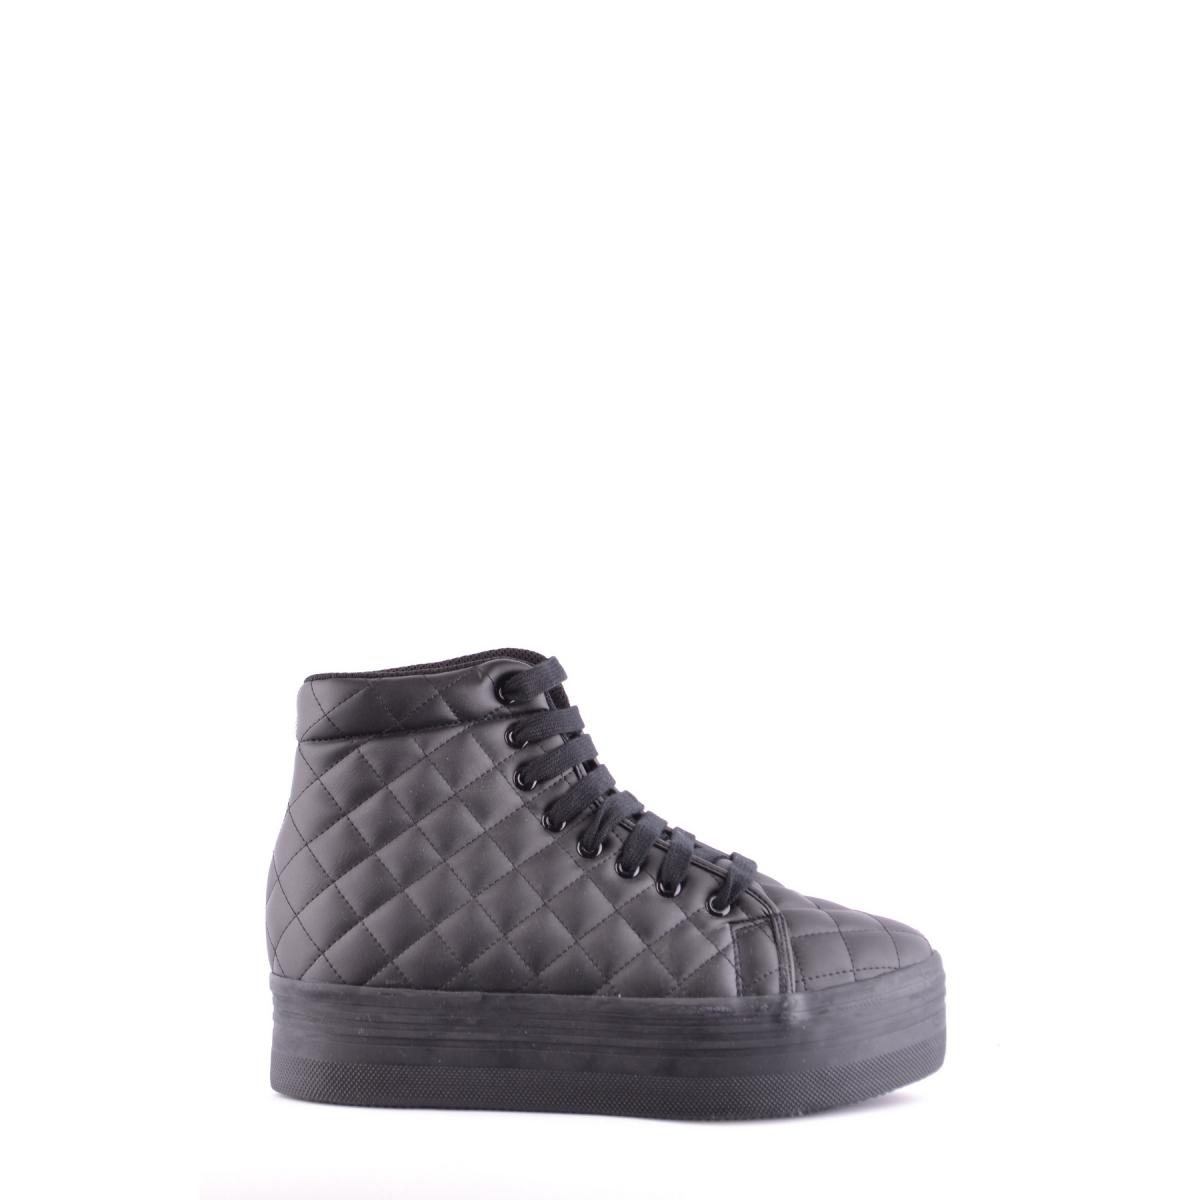 Sneakers alte JEFFREY JC PLAY BY JEFFREY alte CAMPBELL 32670IT -20% bf391a